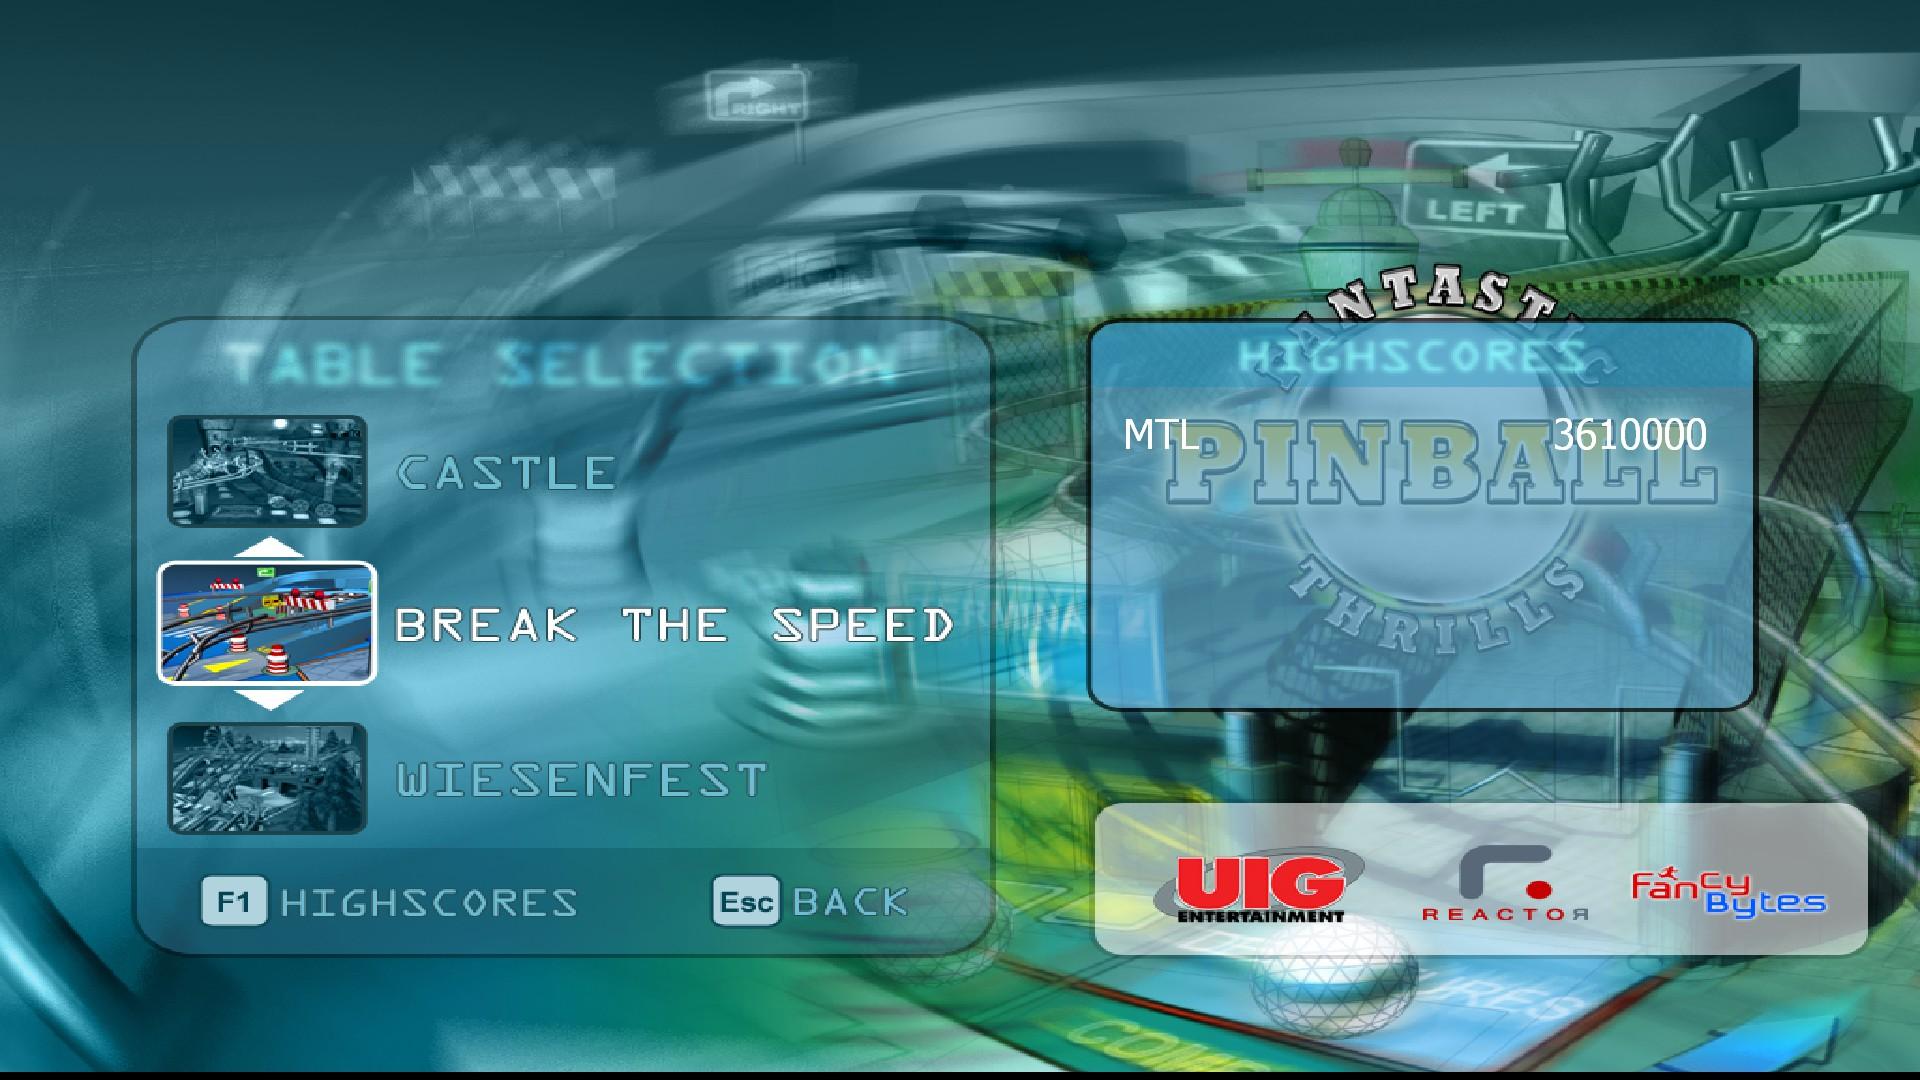 Mantalow: Fantastic Pinball Thrills: Break the Speed (PC) 3,610,000 points on 2015-10-11 03:06:31